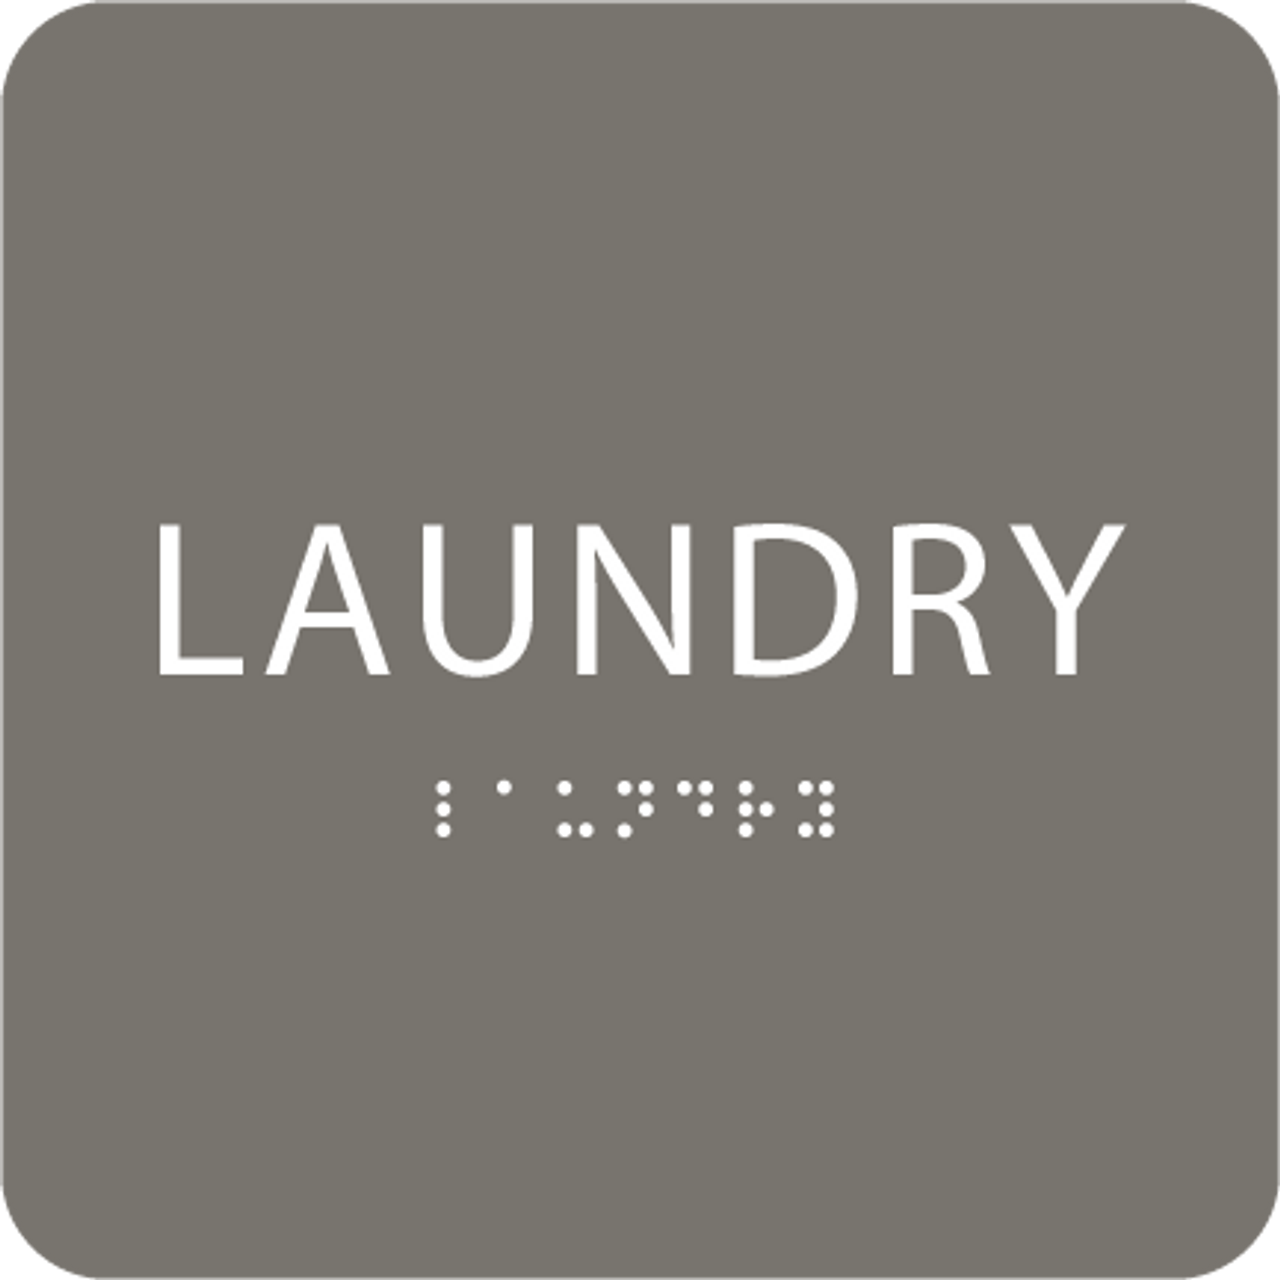 Dark Grey Laundry ADA Sign